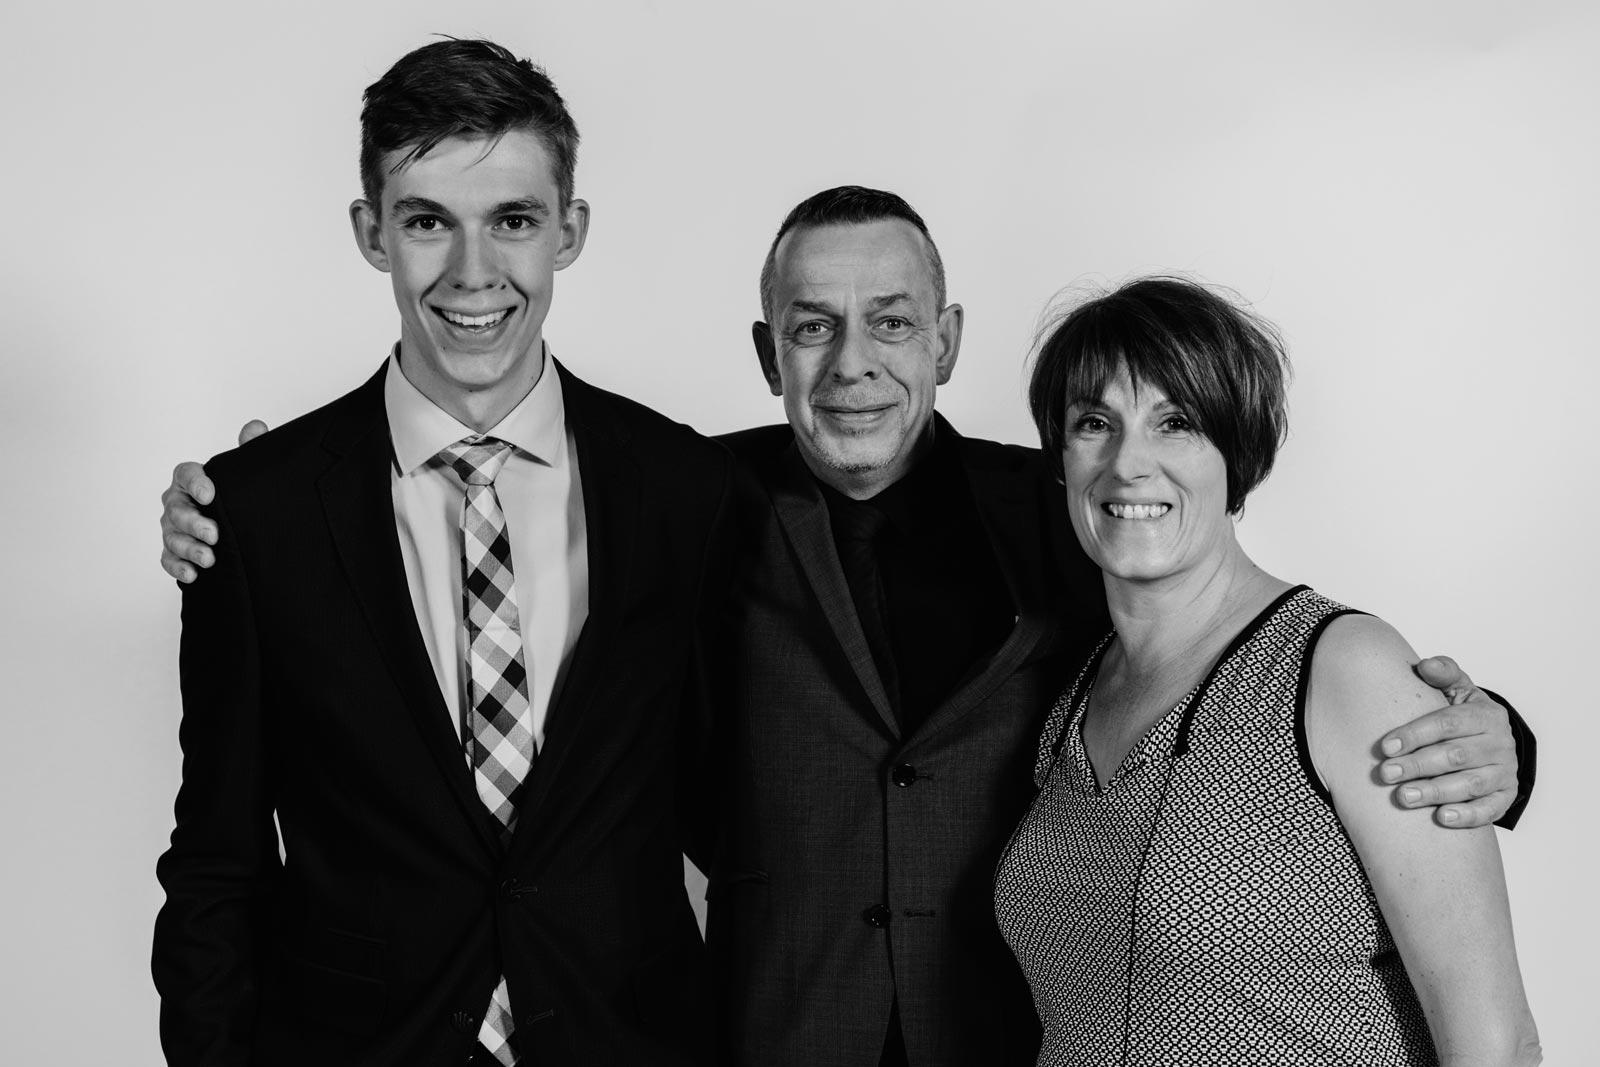 TiPTO (v. l.: Tim, Thomas (Tom) & Petra Bartelsen). Foto: © GVO MEDIA / Gregor Ott